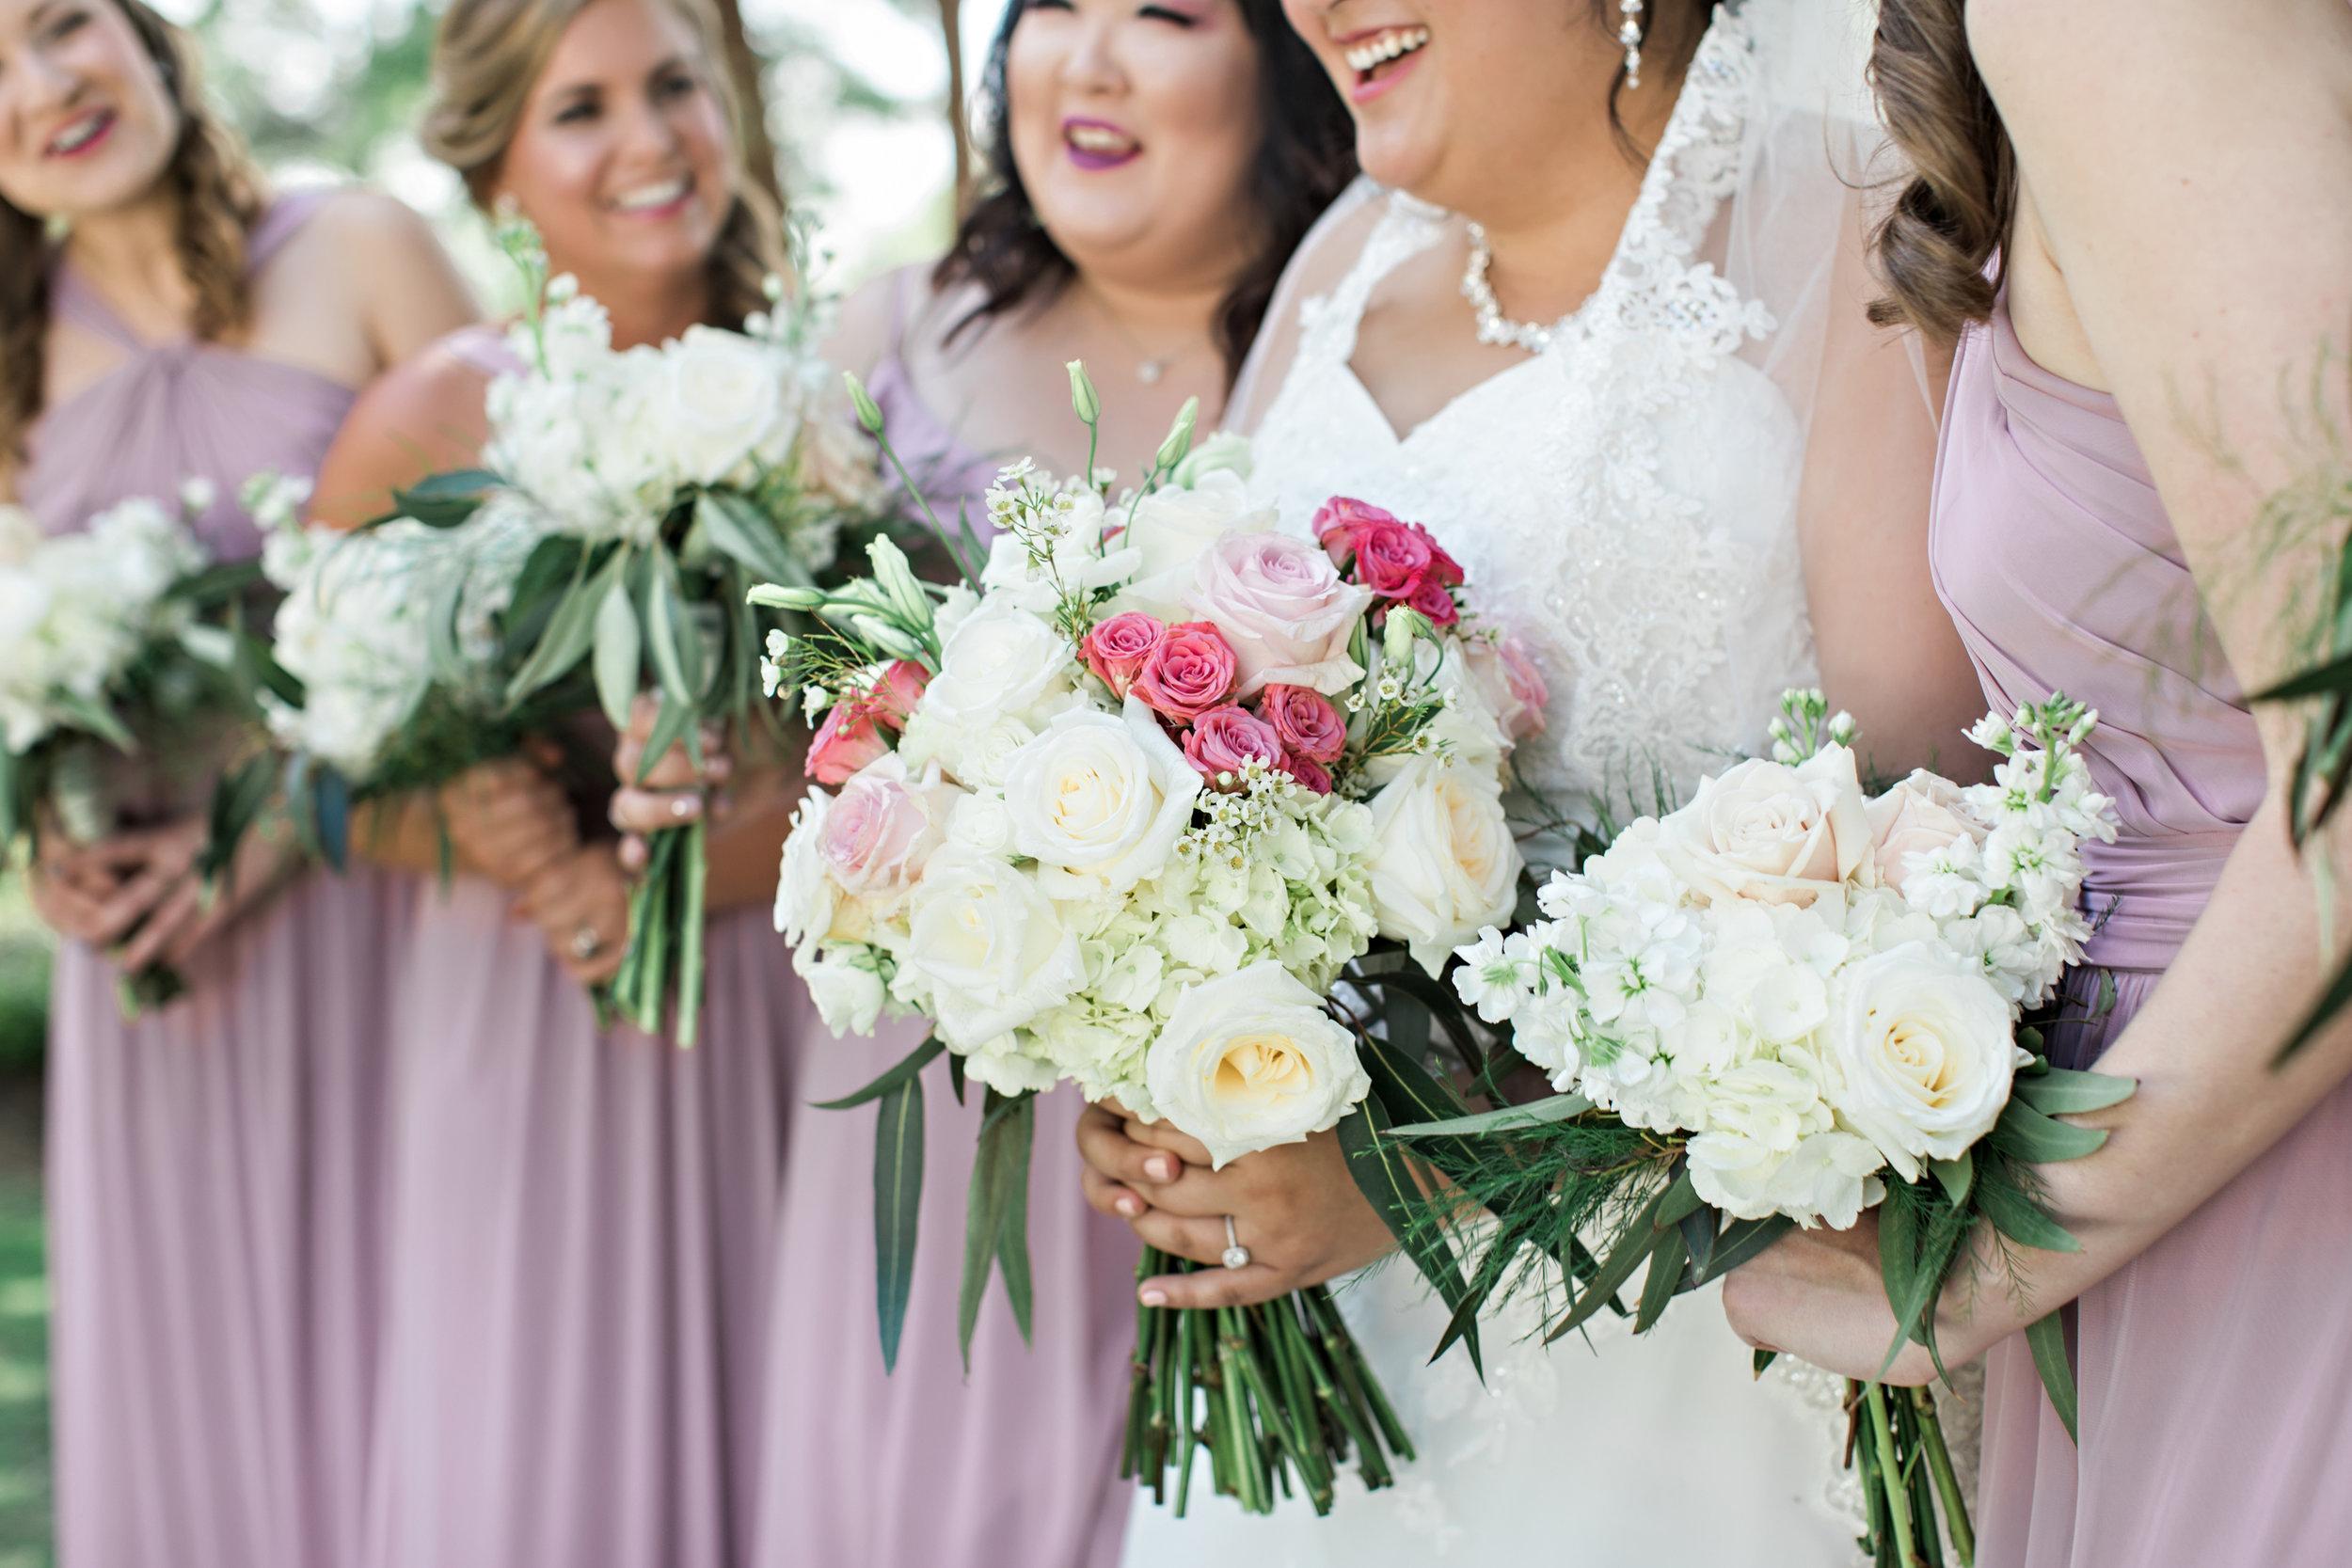 Ni ck-Drollette-Photography-Auburn-Alabama-Weddings-Sylvia-Kevin-109.jpg